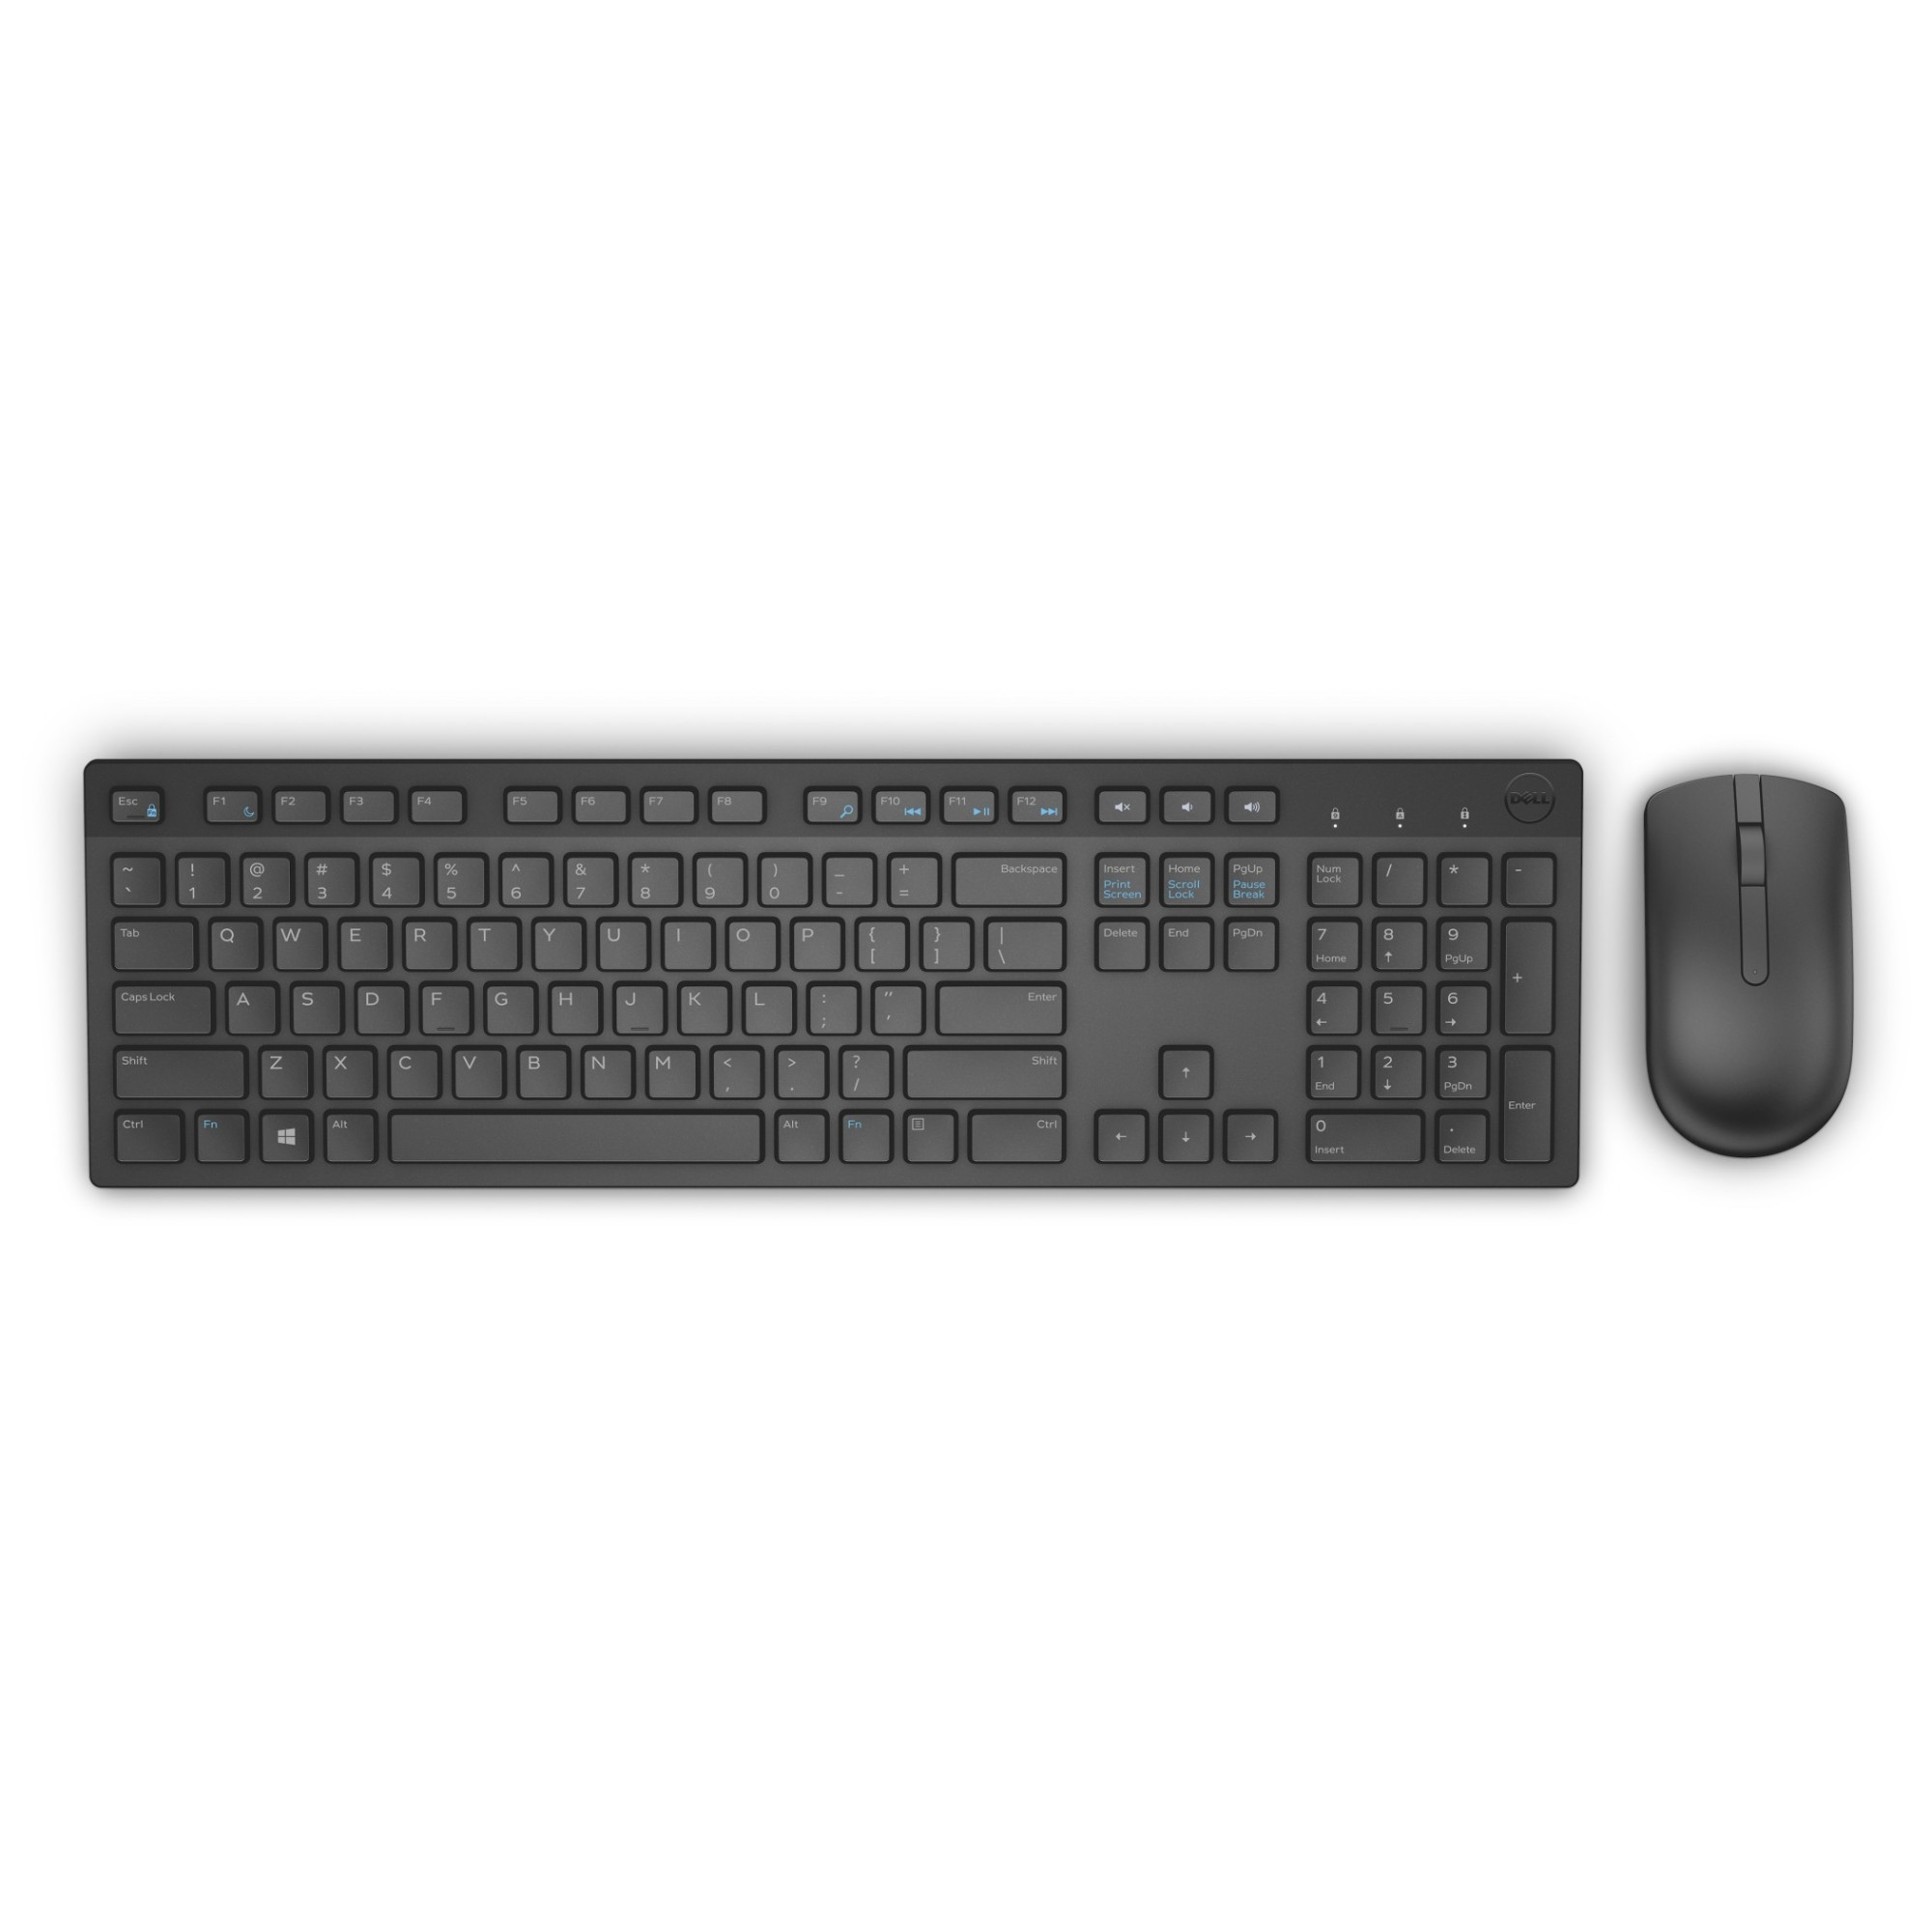 DELL KM636 toetsenbord RF Draadloos QWERTY US International Zwart